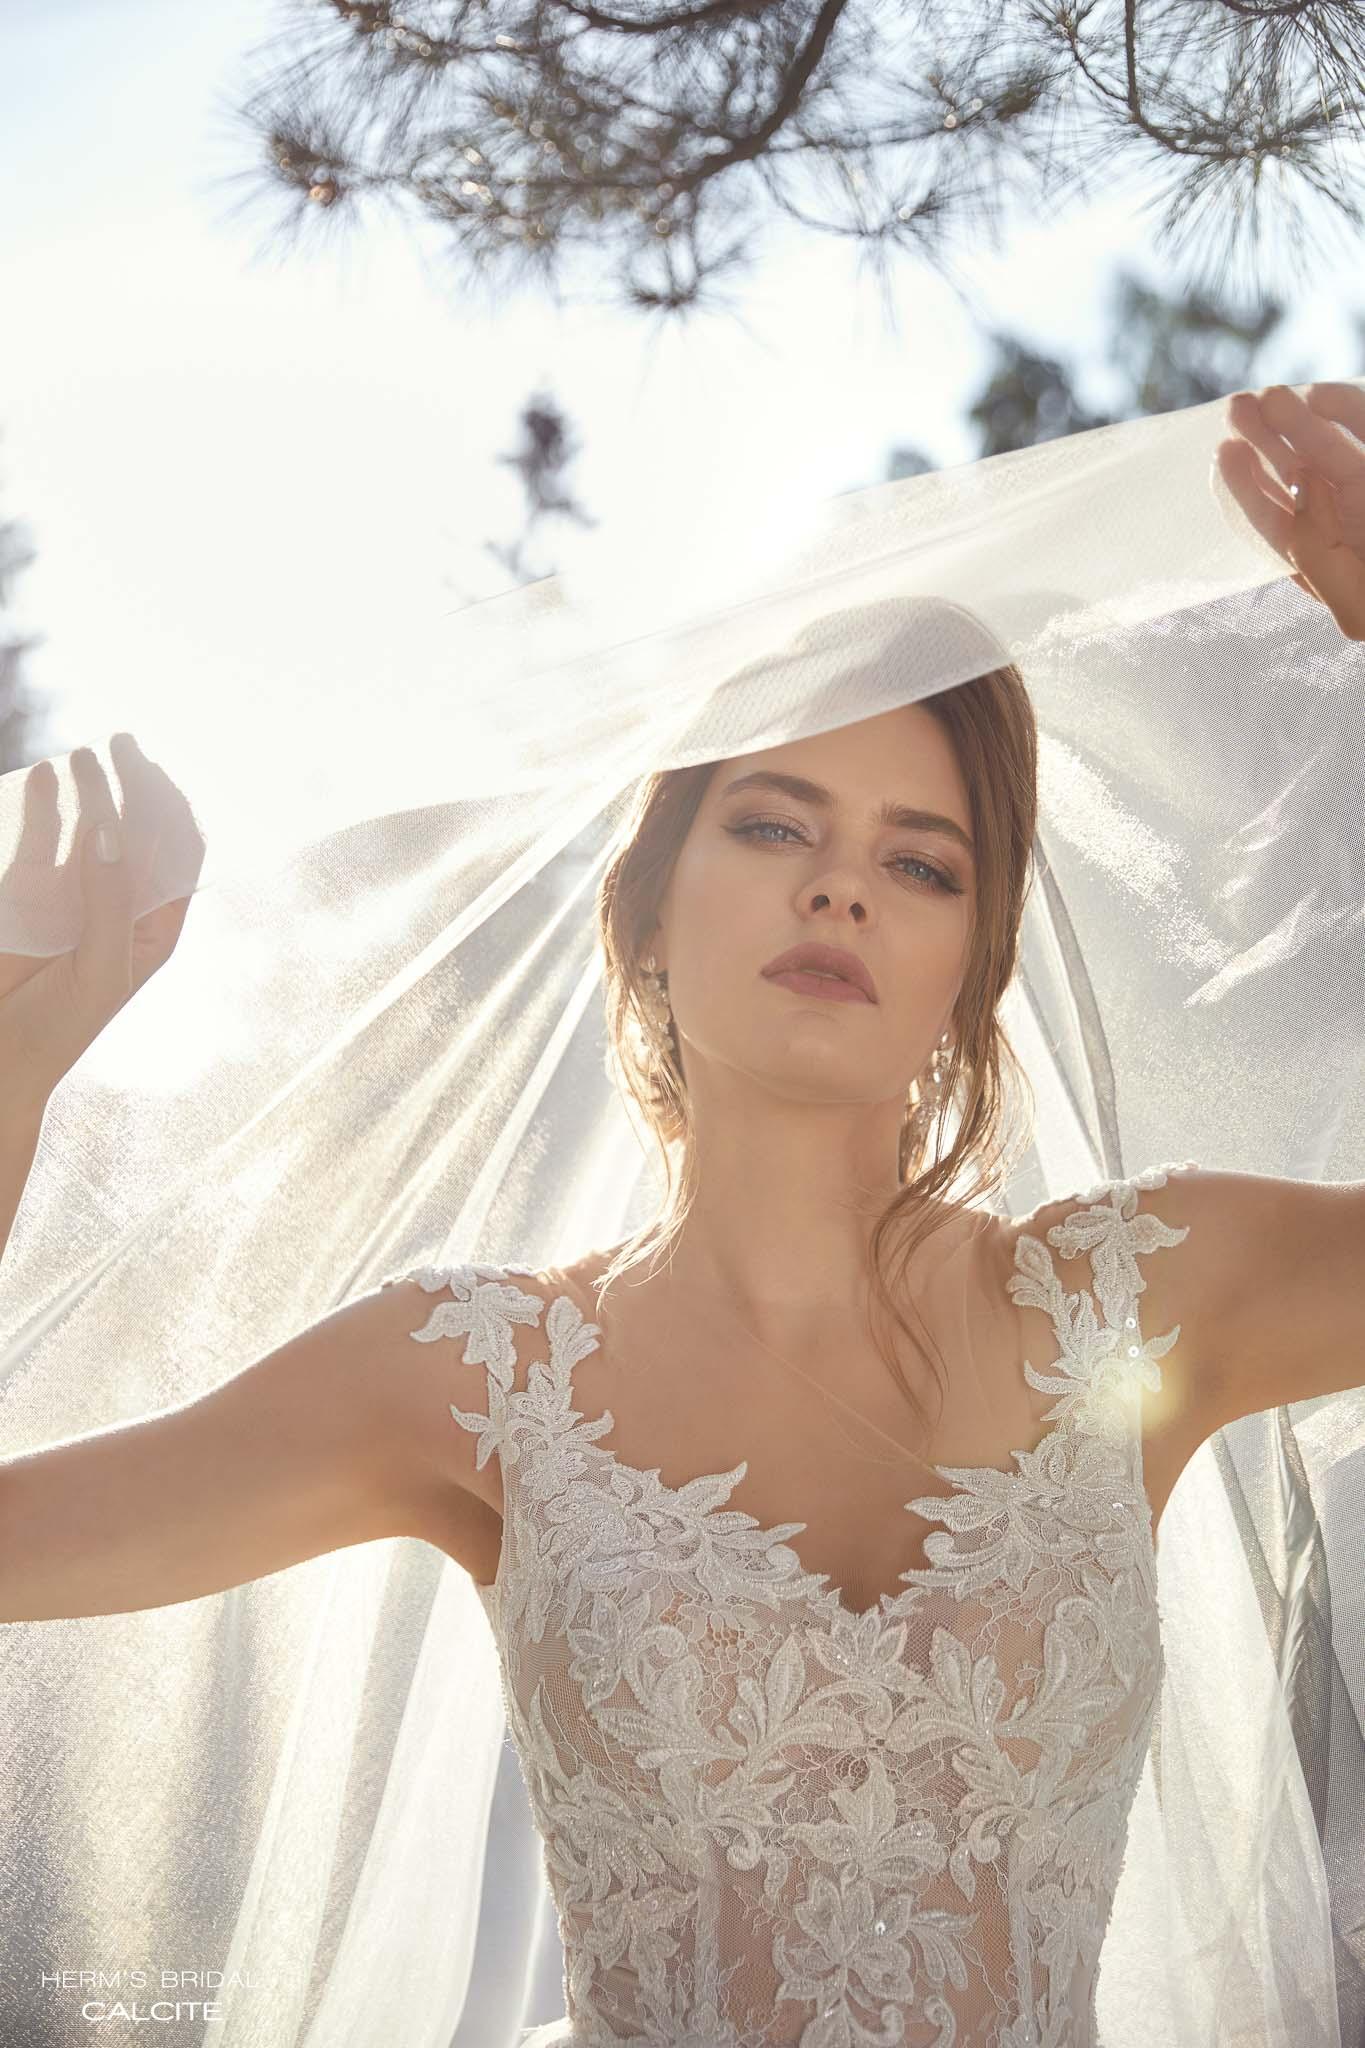 wedding dress herms bridal calcite